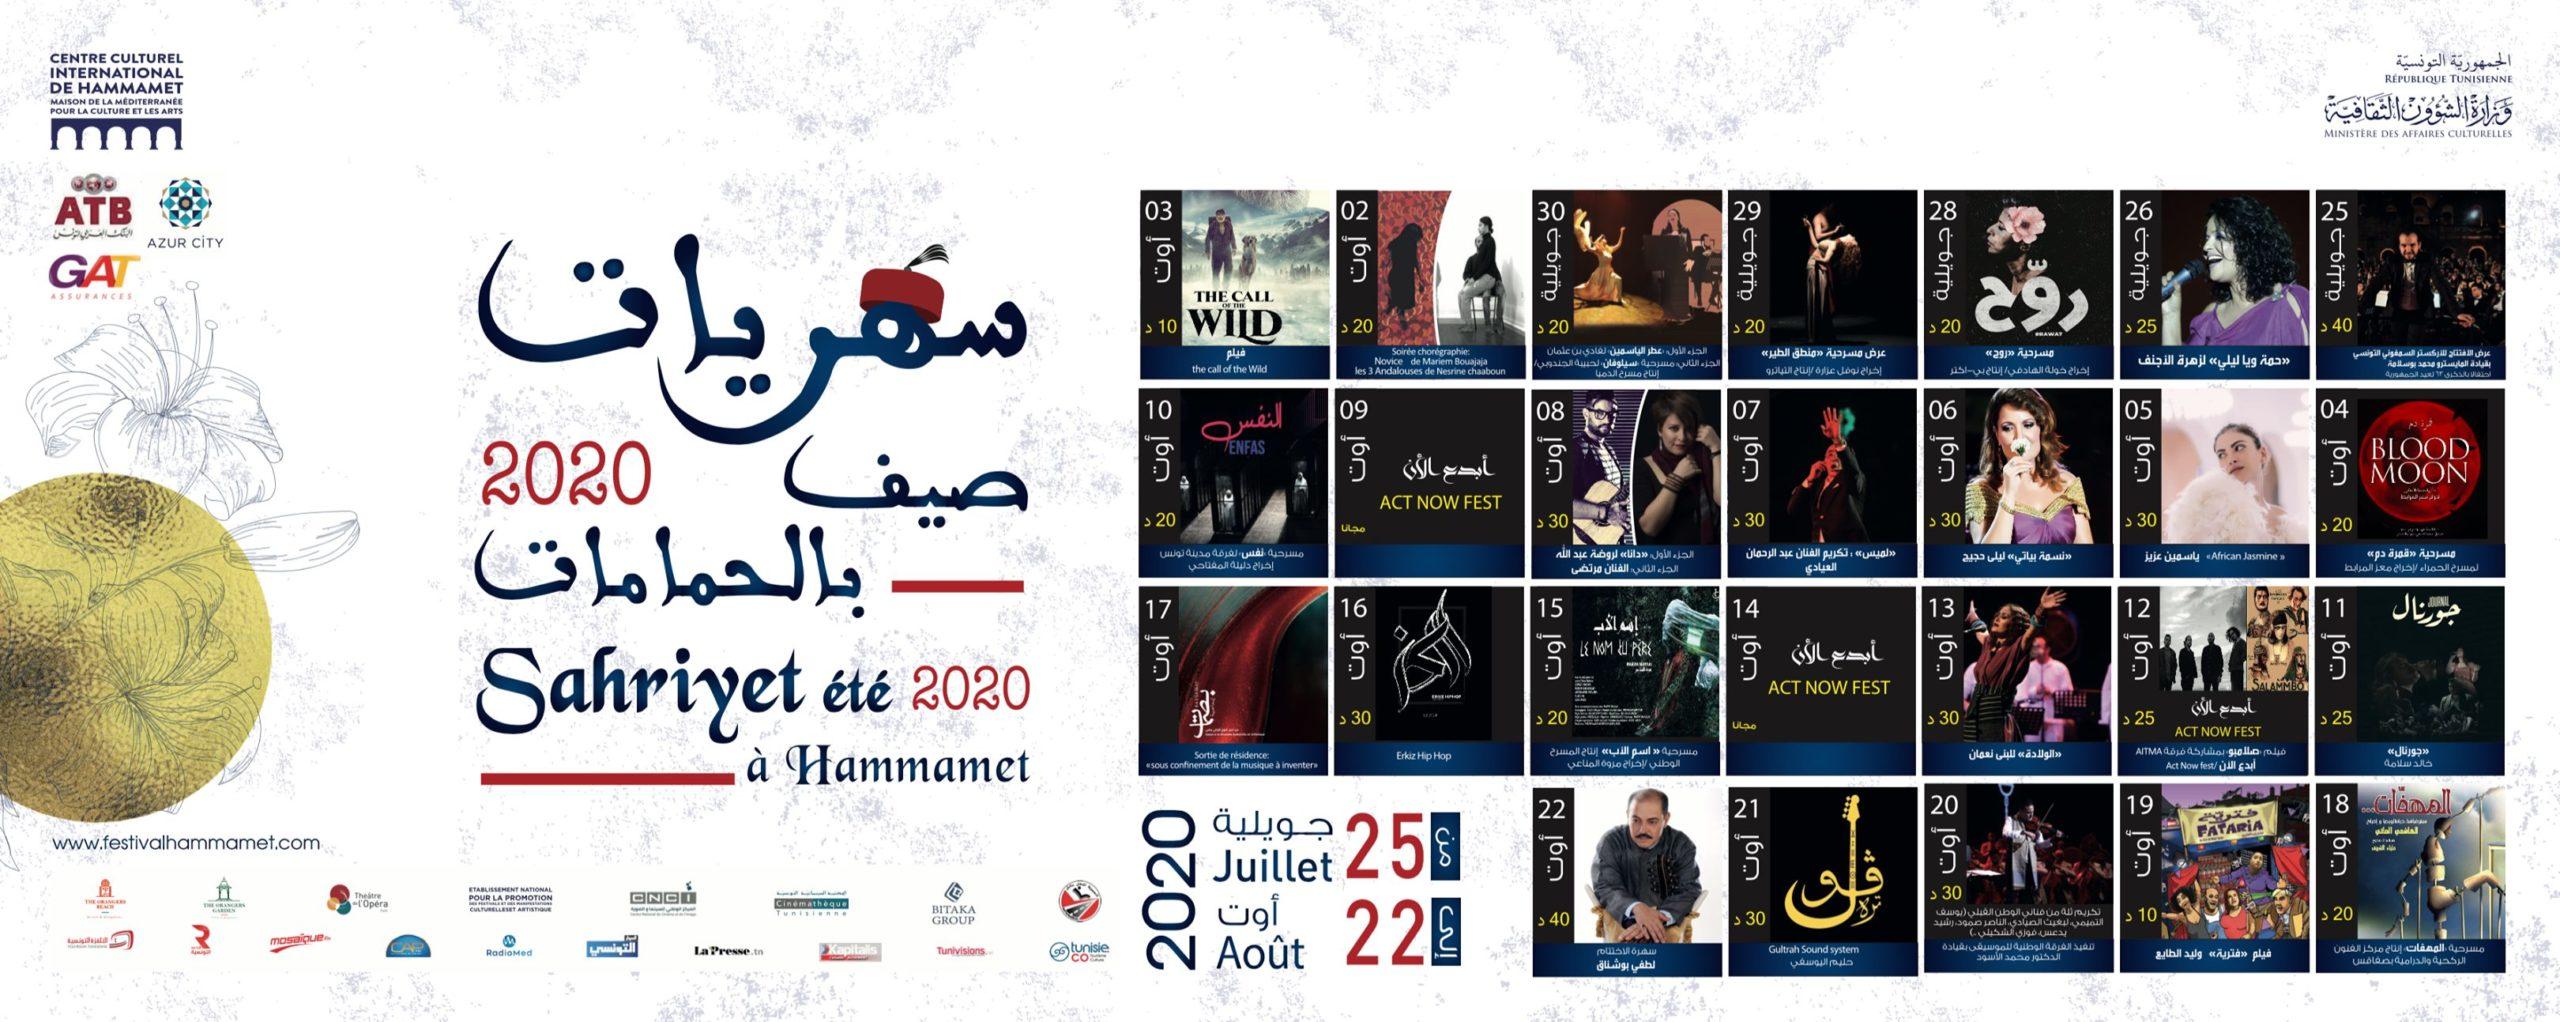 Programme Festival International de Hammamet 2020